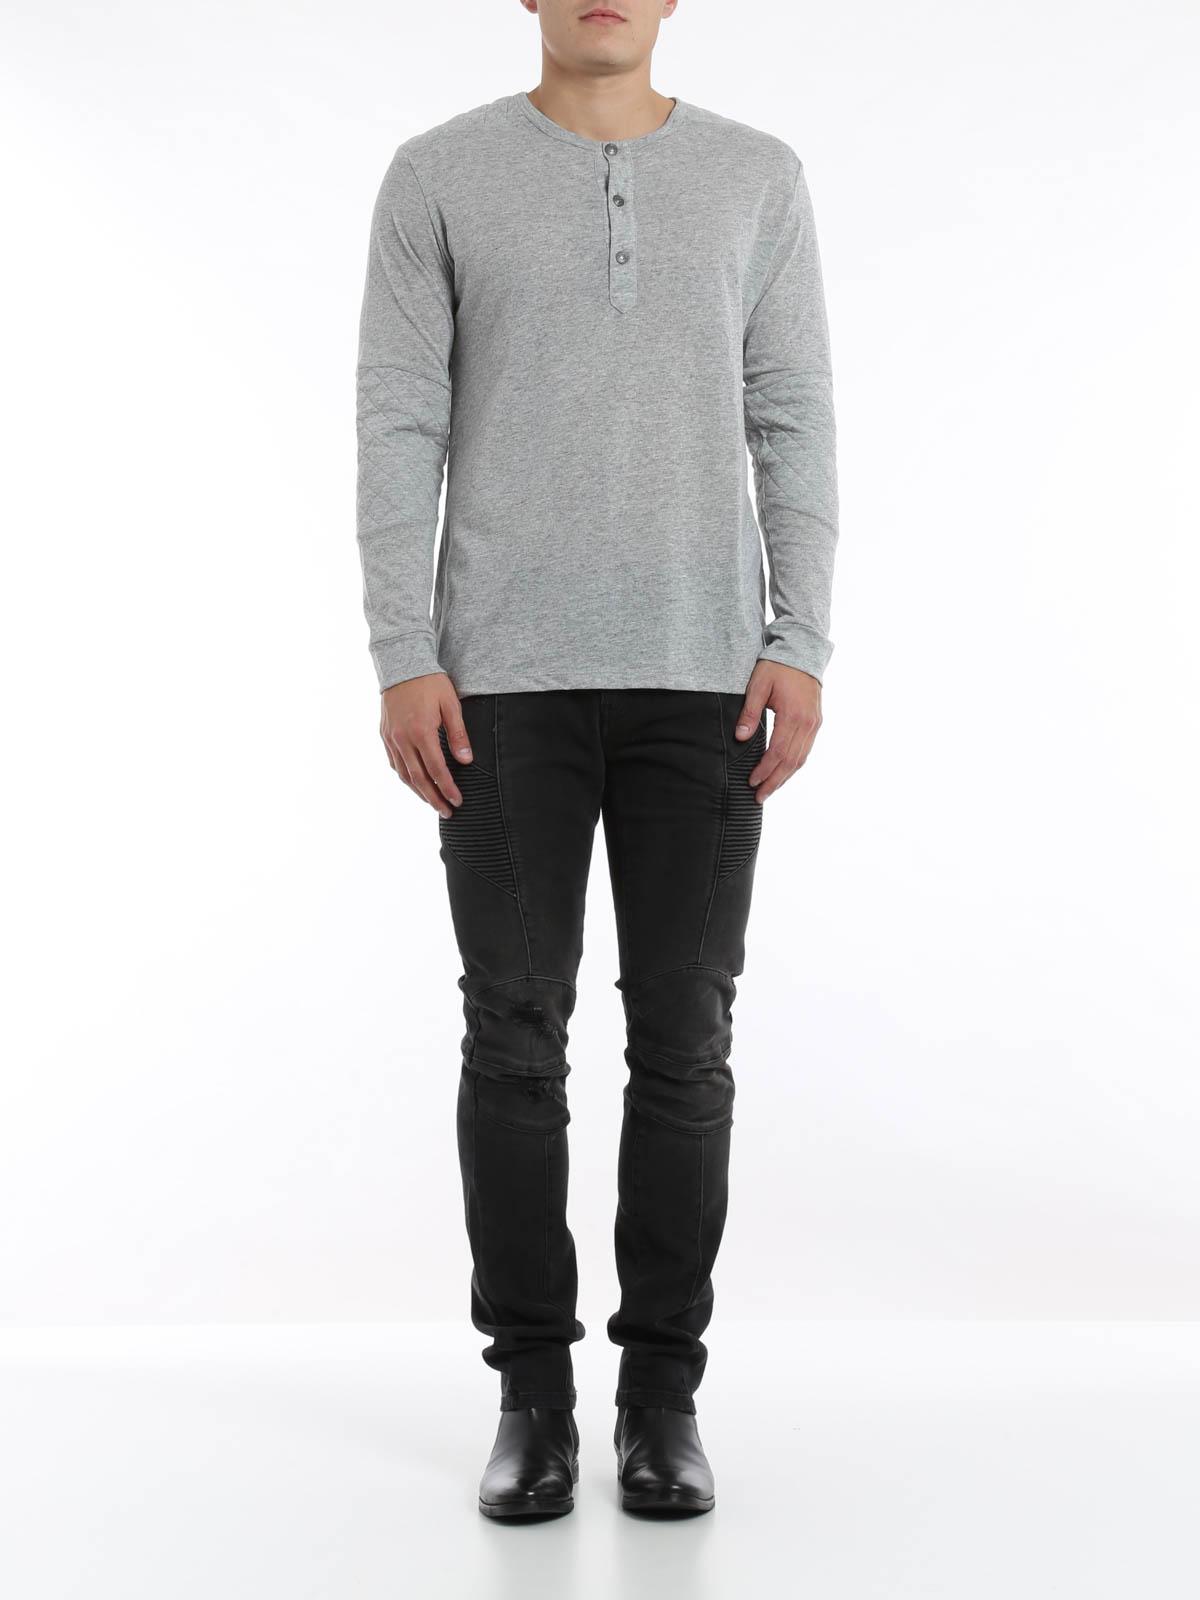 0b9545c6 Pierre Balmain - Crew neck t-shirt with buttons - t-shirts - HP6360SA384